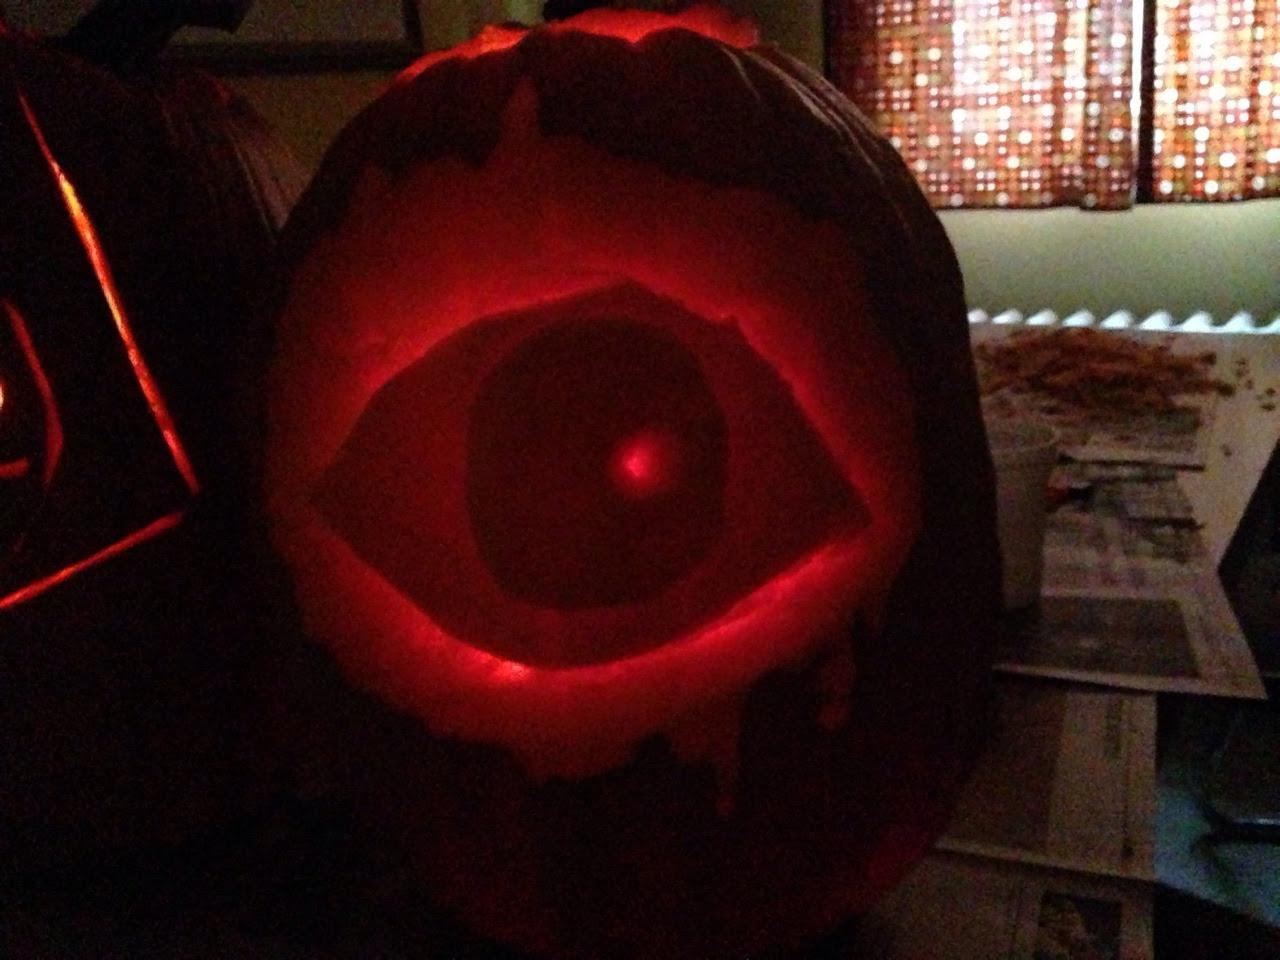 More peripumpkin with an eyeball pumpkin my frand did I'm so proud of my peripumpkin!!